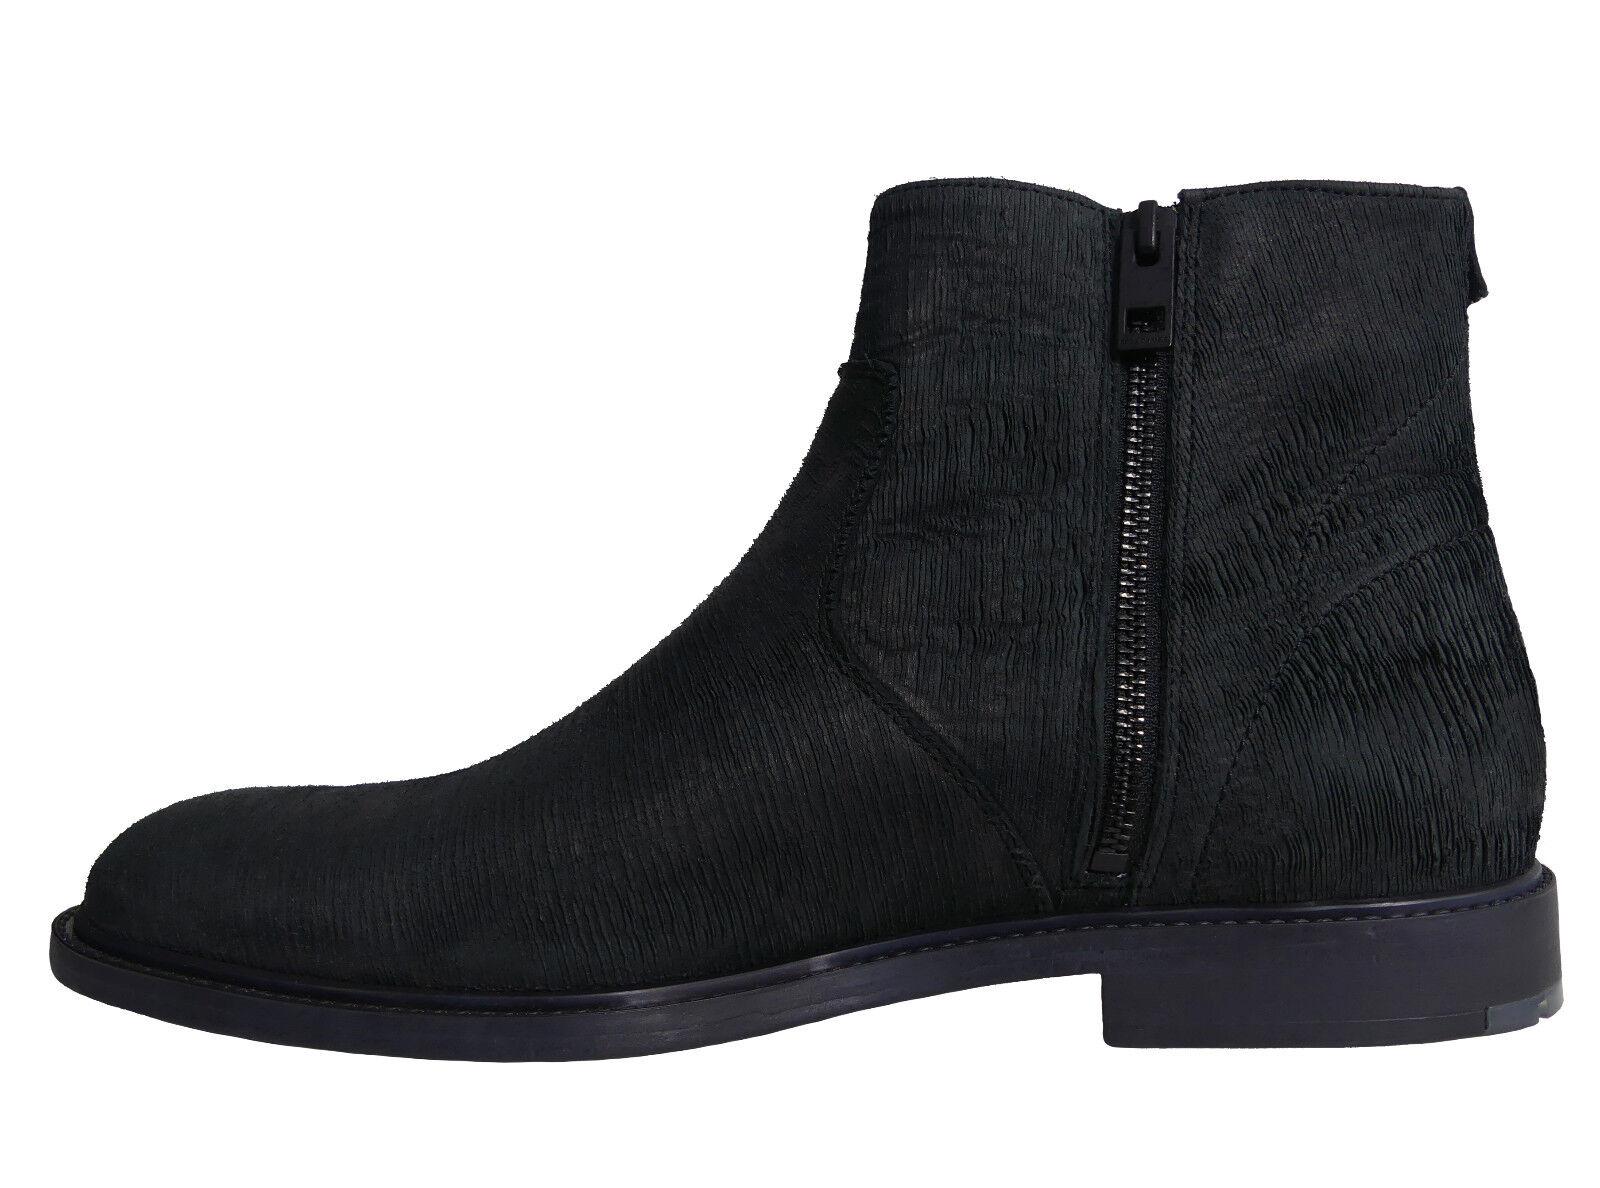 BOSS Orange Schuhe Stiefel Stiefel  Gr. 44 UK 10 US 11 NEU